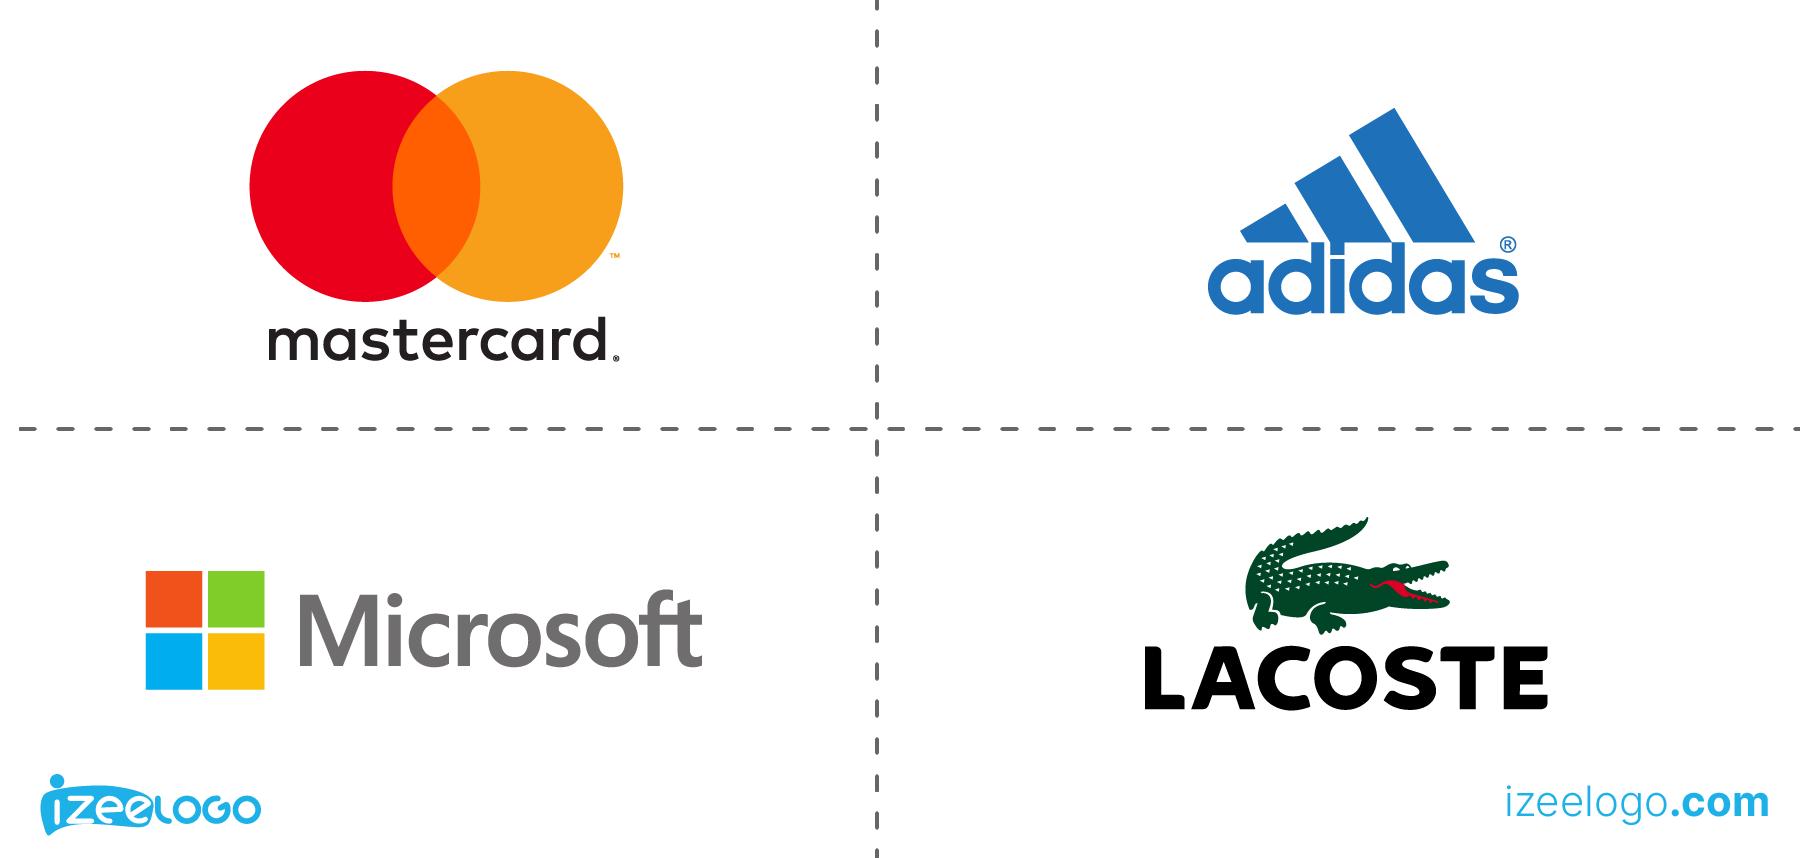 Exemples de logo combiné : logo Mastercard, logo Lacoste PNG, logo Microsoft PNG et logo Adidas PNG.